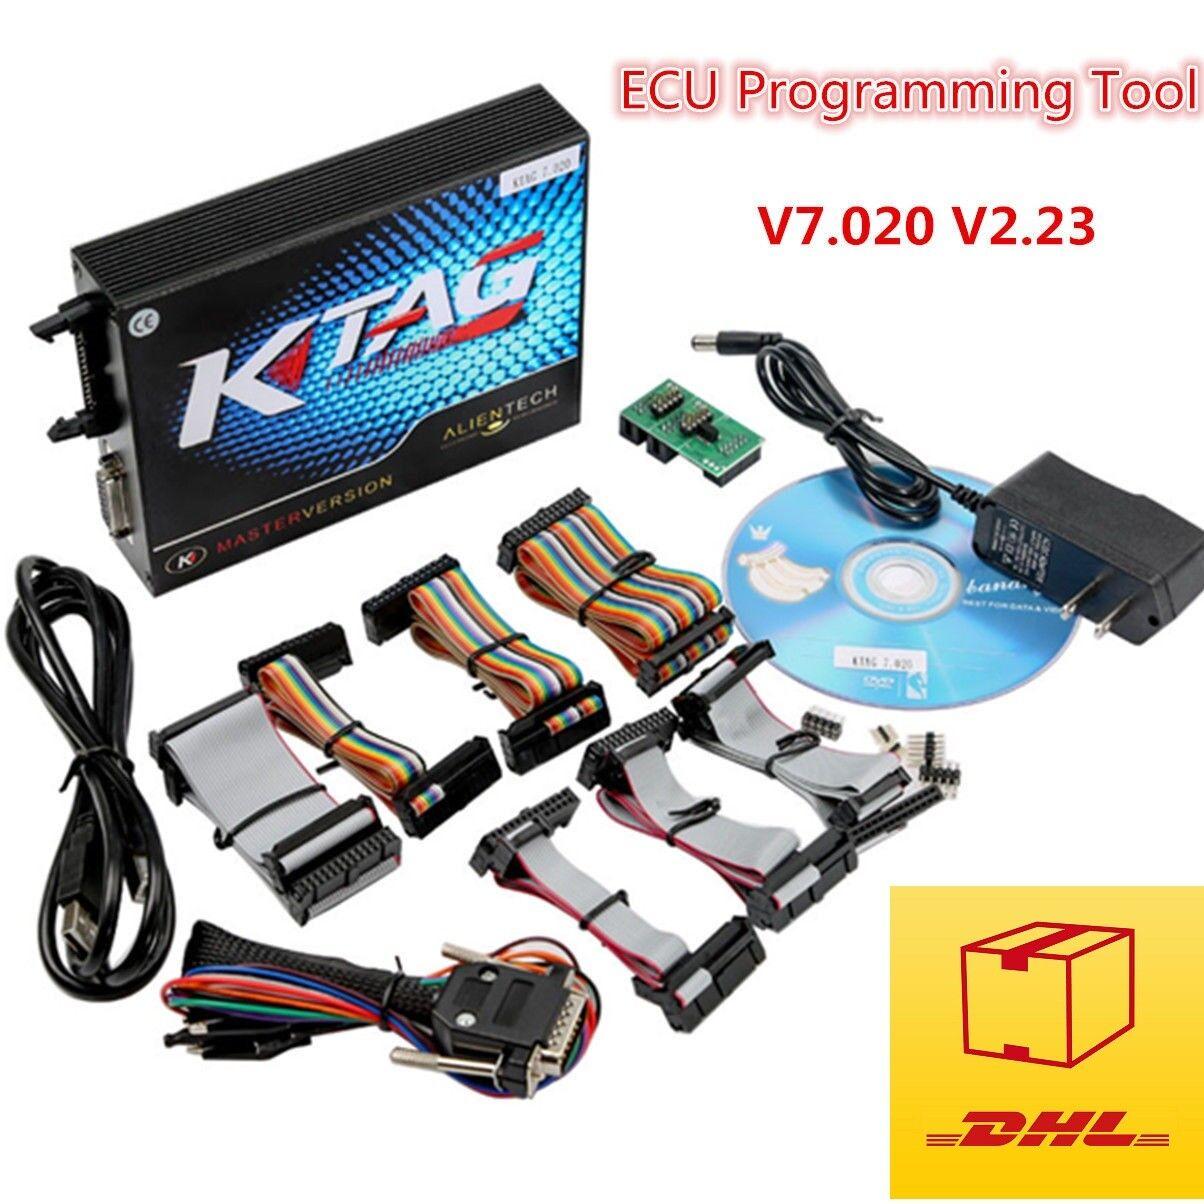 KTAG ECU Programming Tool FW V2.13_V6.070 - V2.23_V7.020 KTAG Unlimited Token